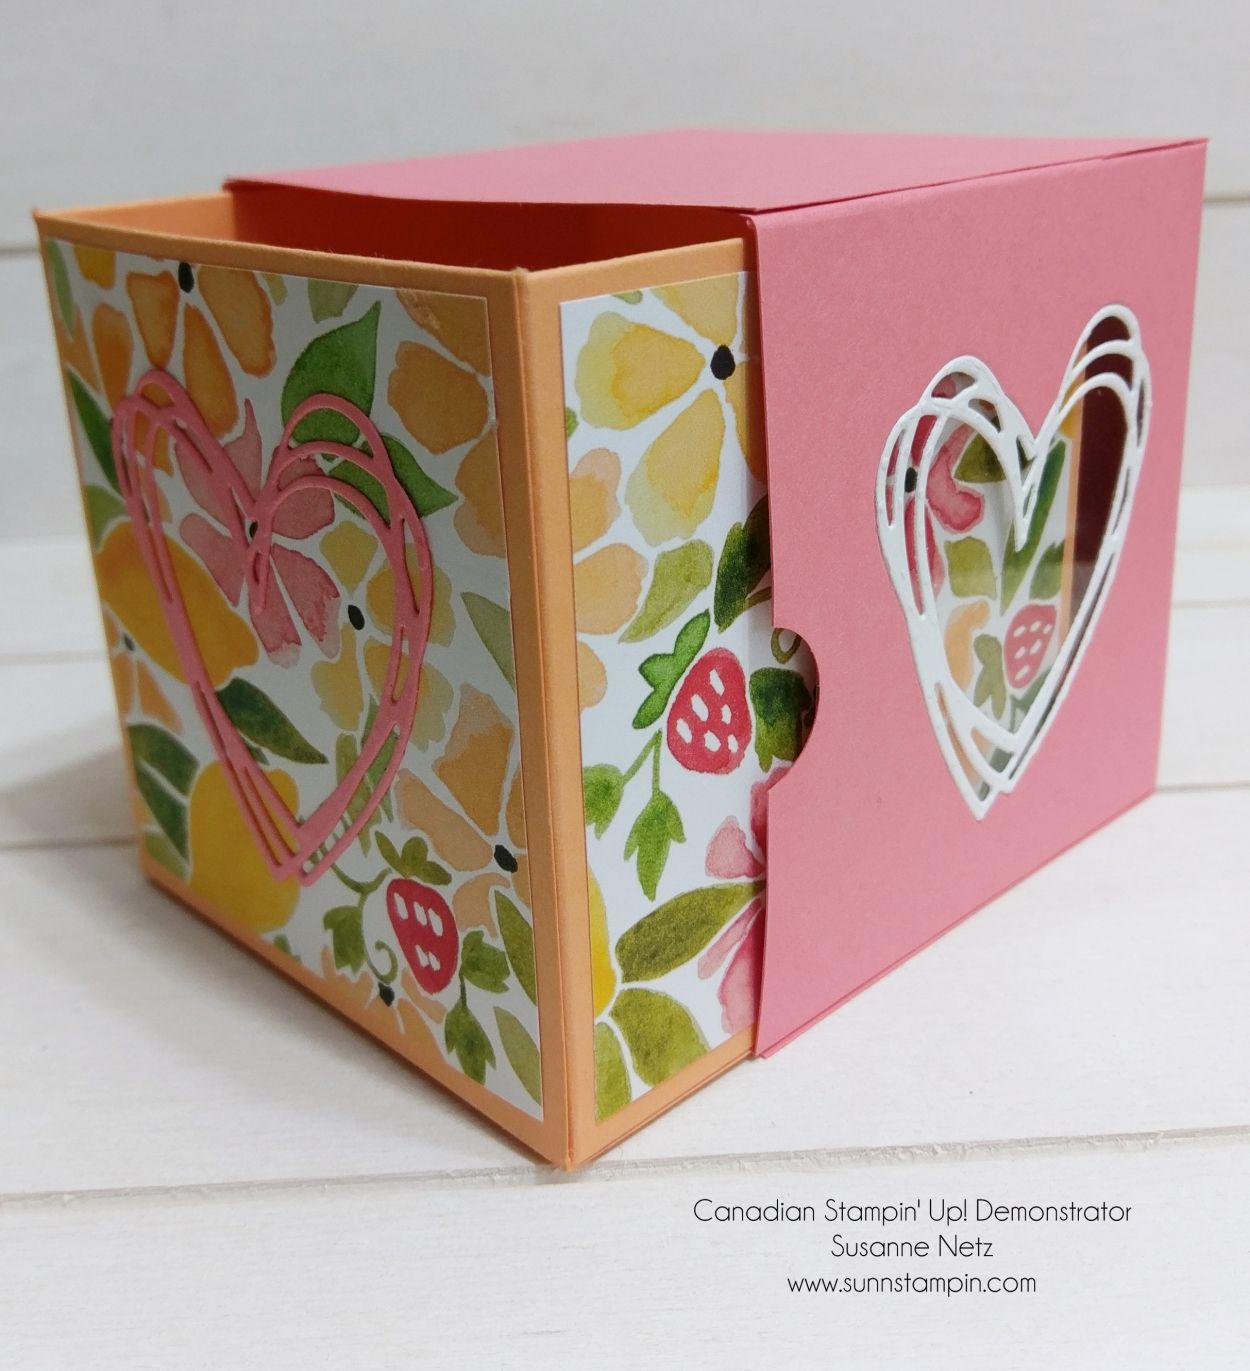 Canadian Stampin' Up! Demonstrator - Susanne Netz -  Shares Handmade Papercrafting Designs & Inspiration